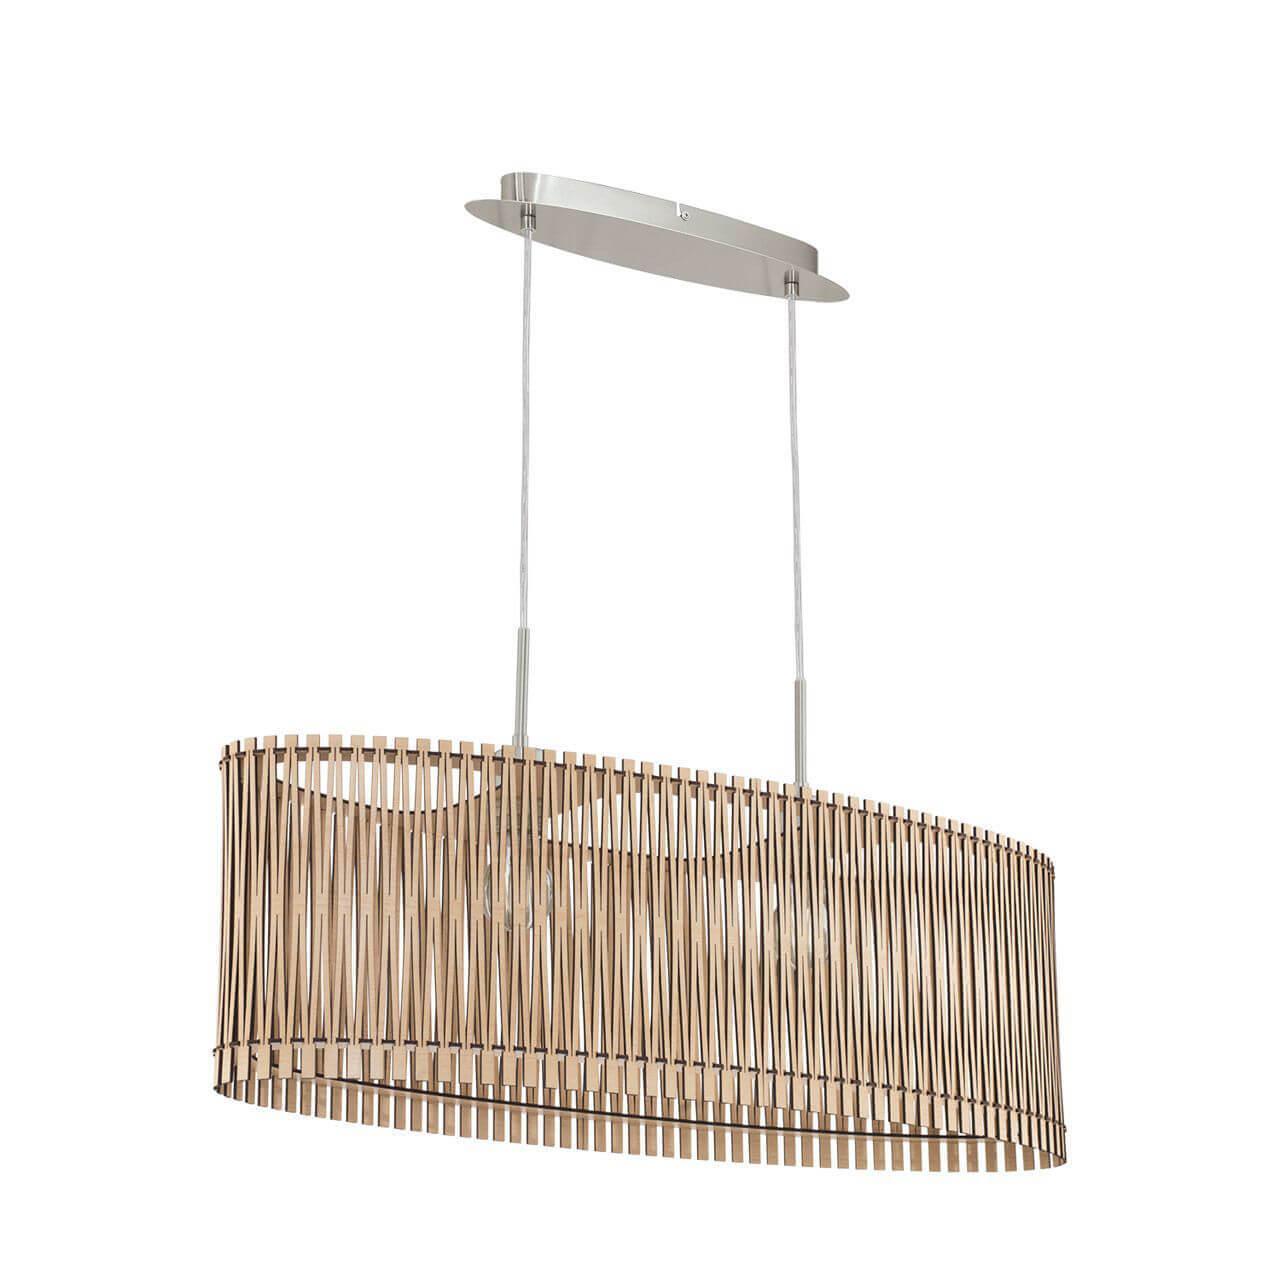 Подвесной светильник Eglo Sendero 96194 цены онлайн